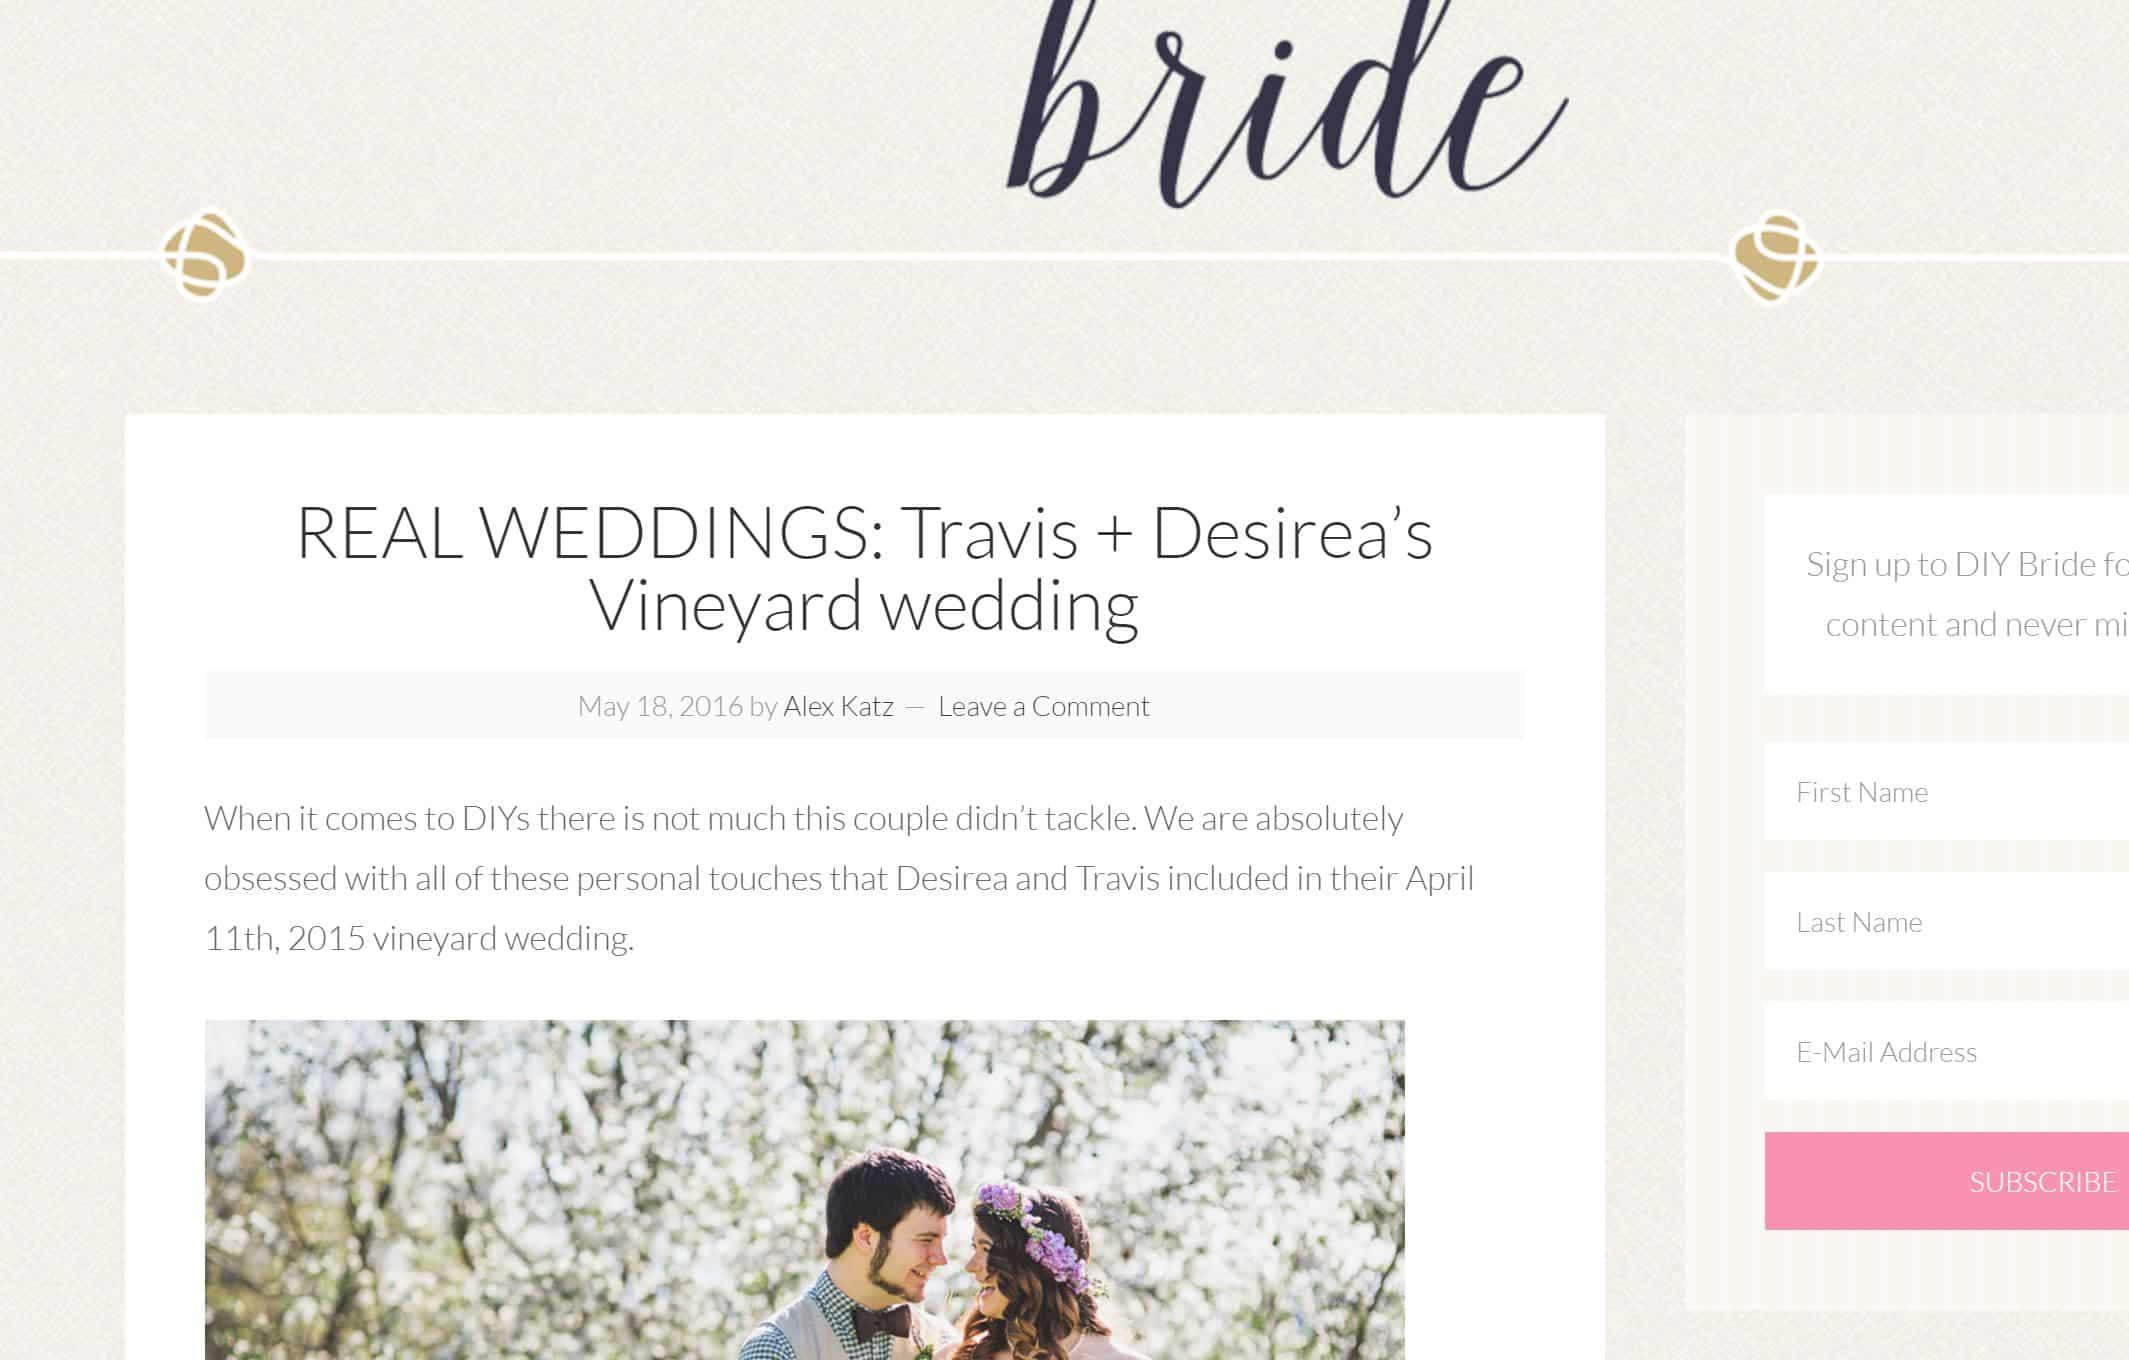 diy bride banner homepage